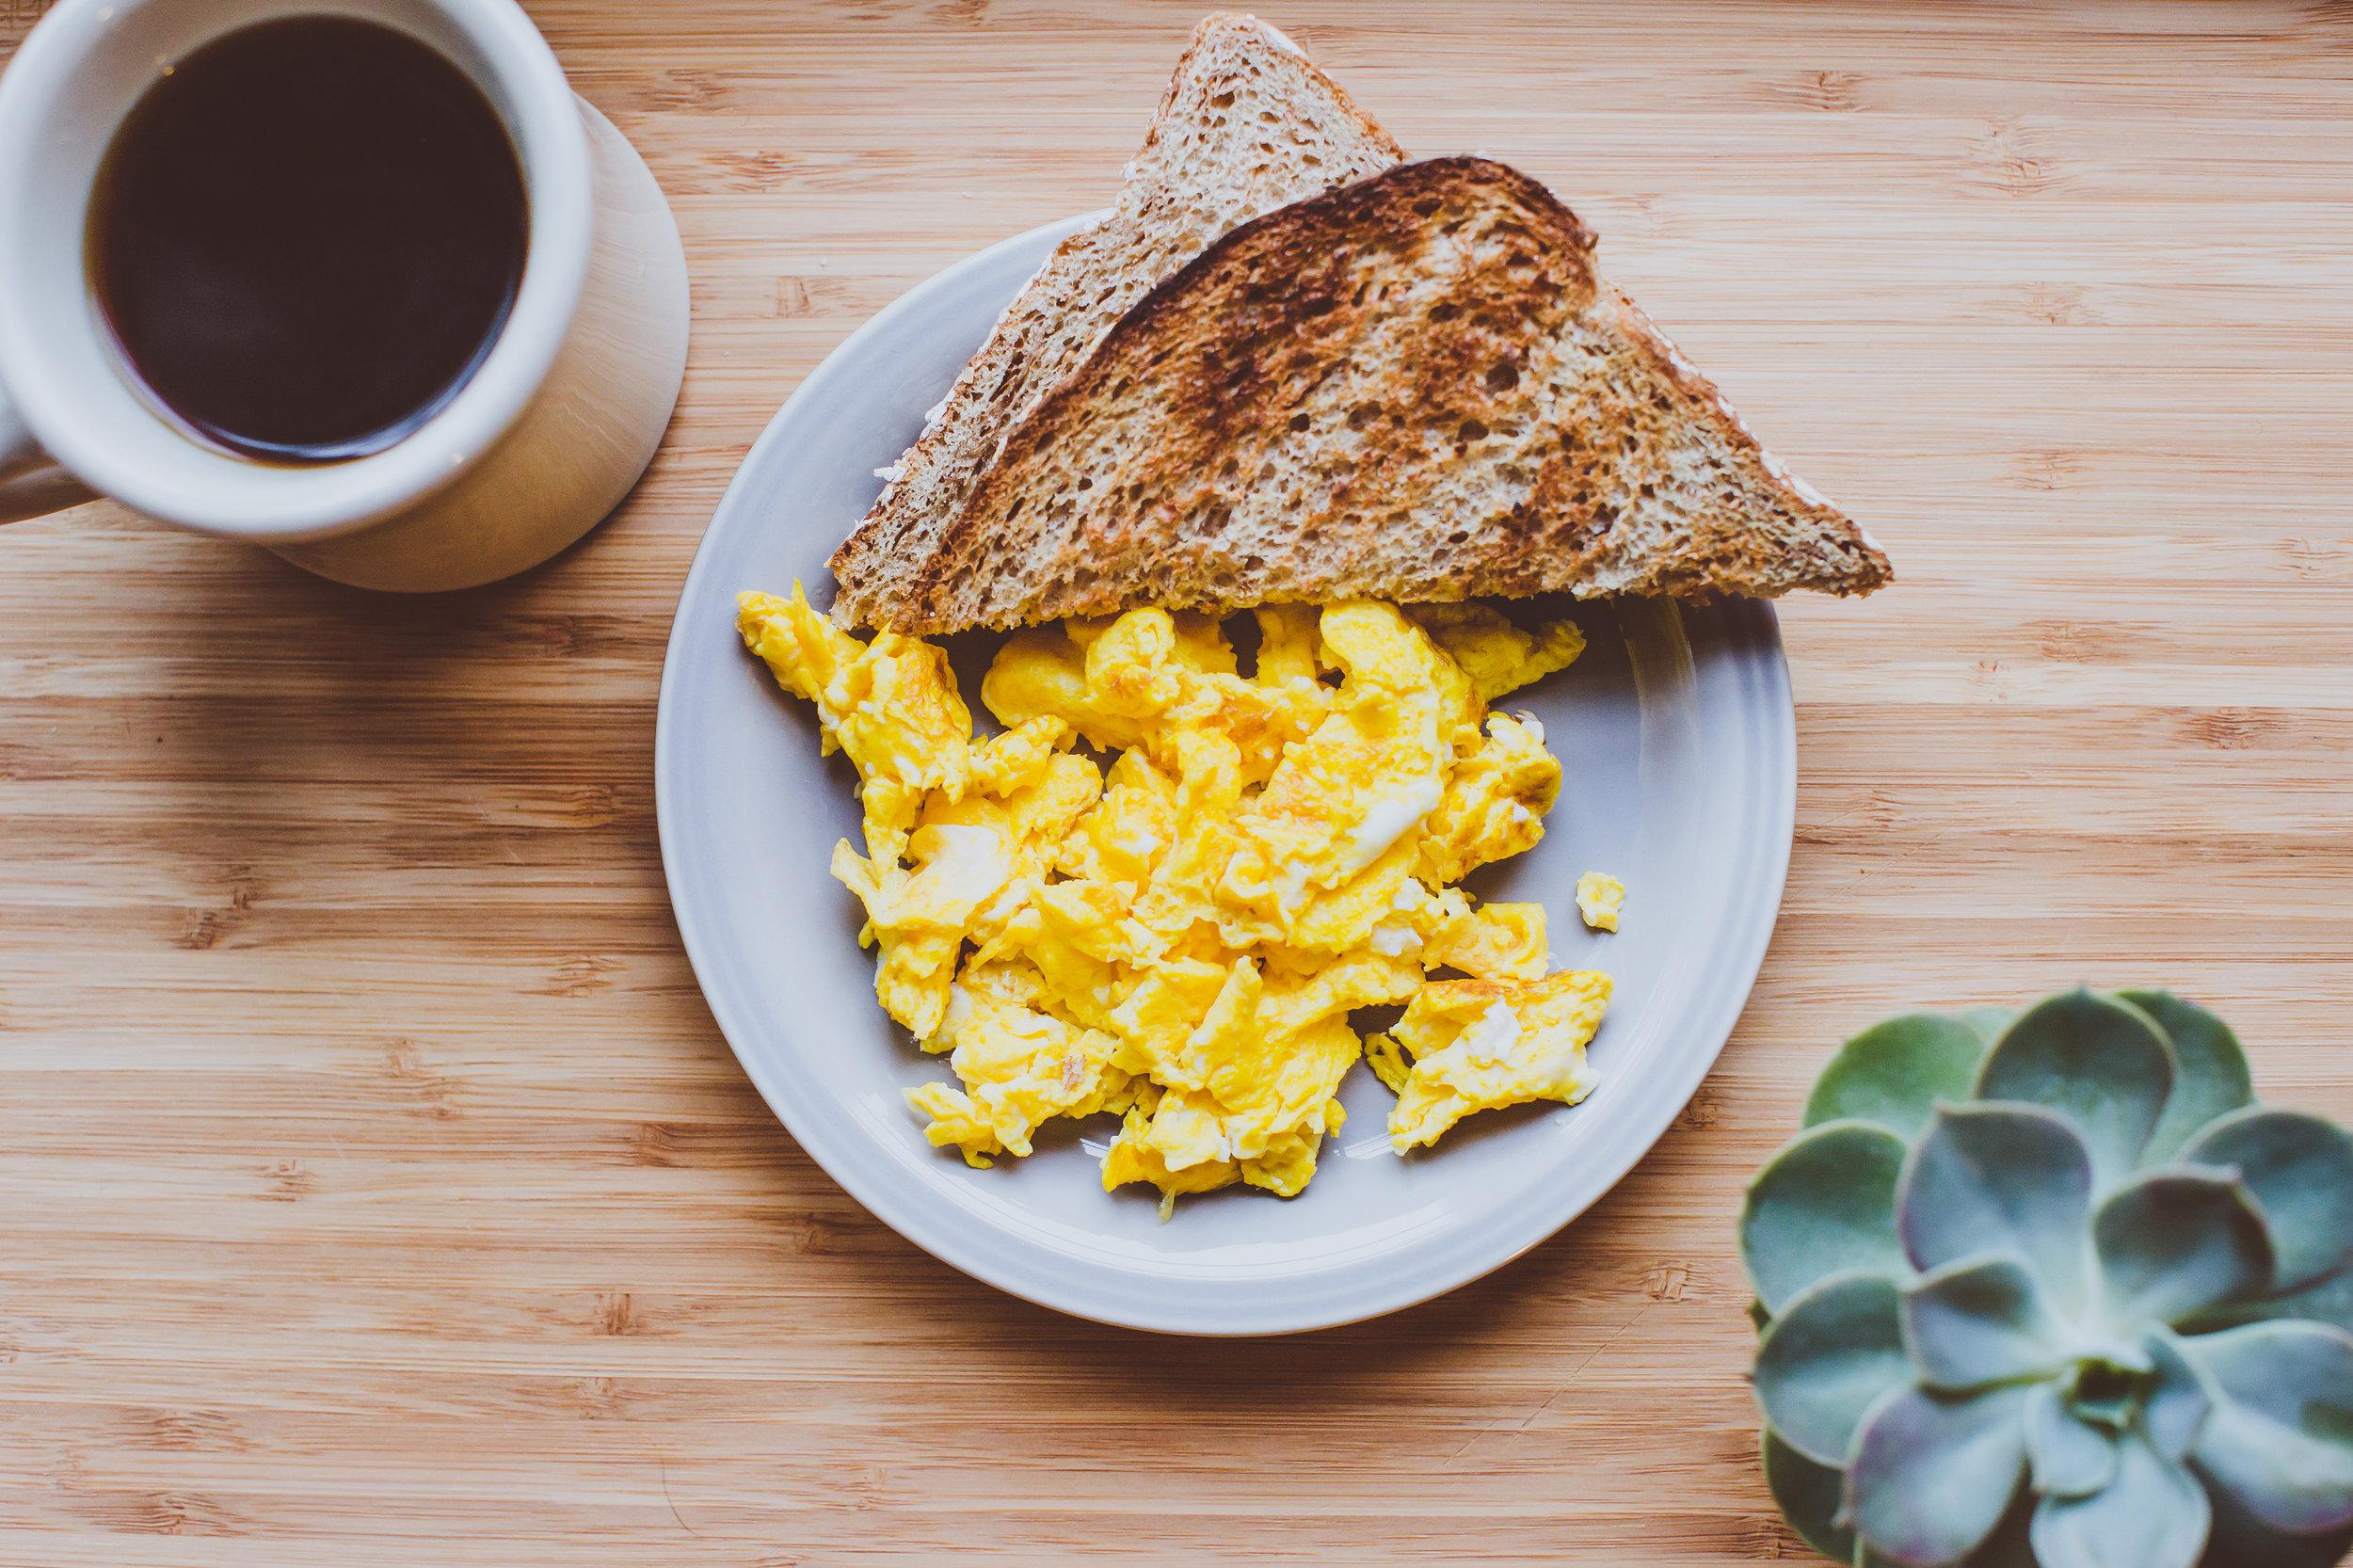 breakfastsausageeggs.jpg